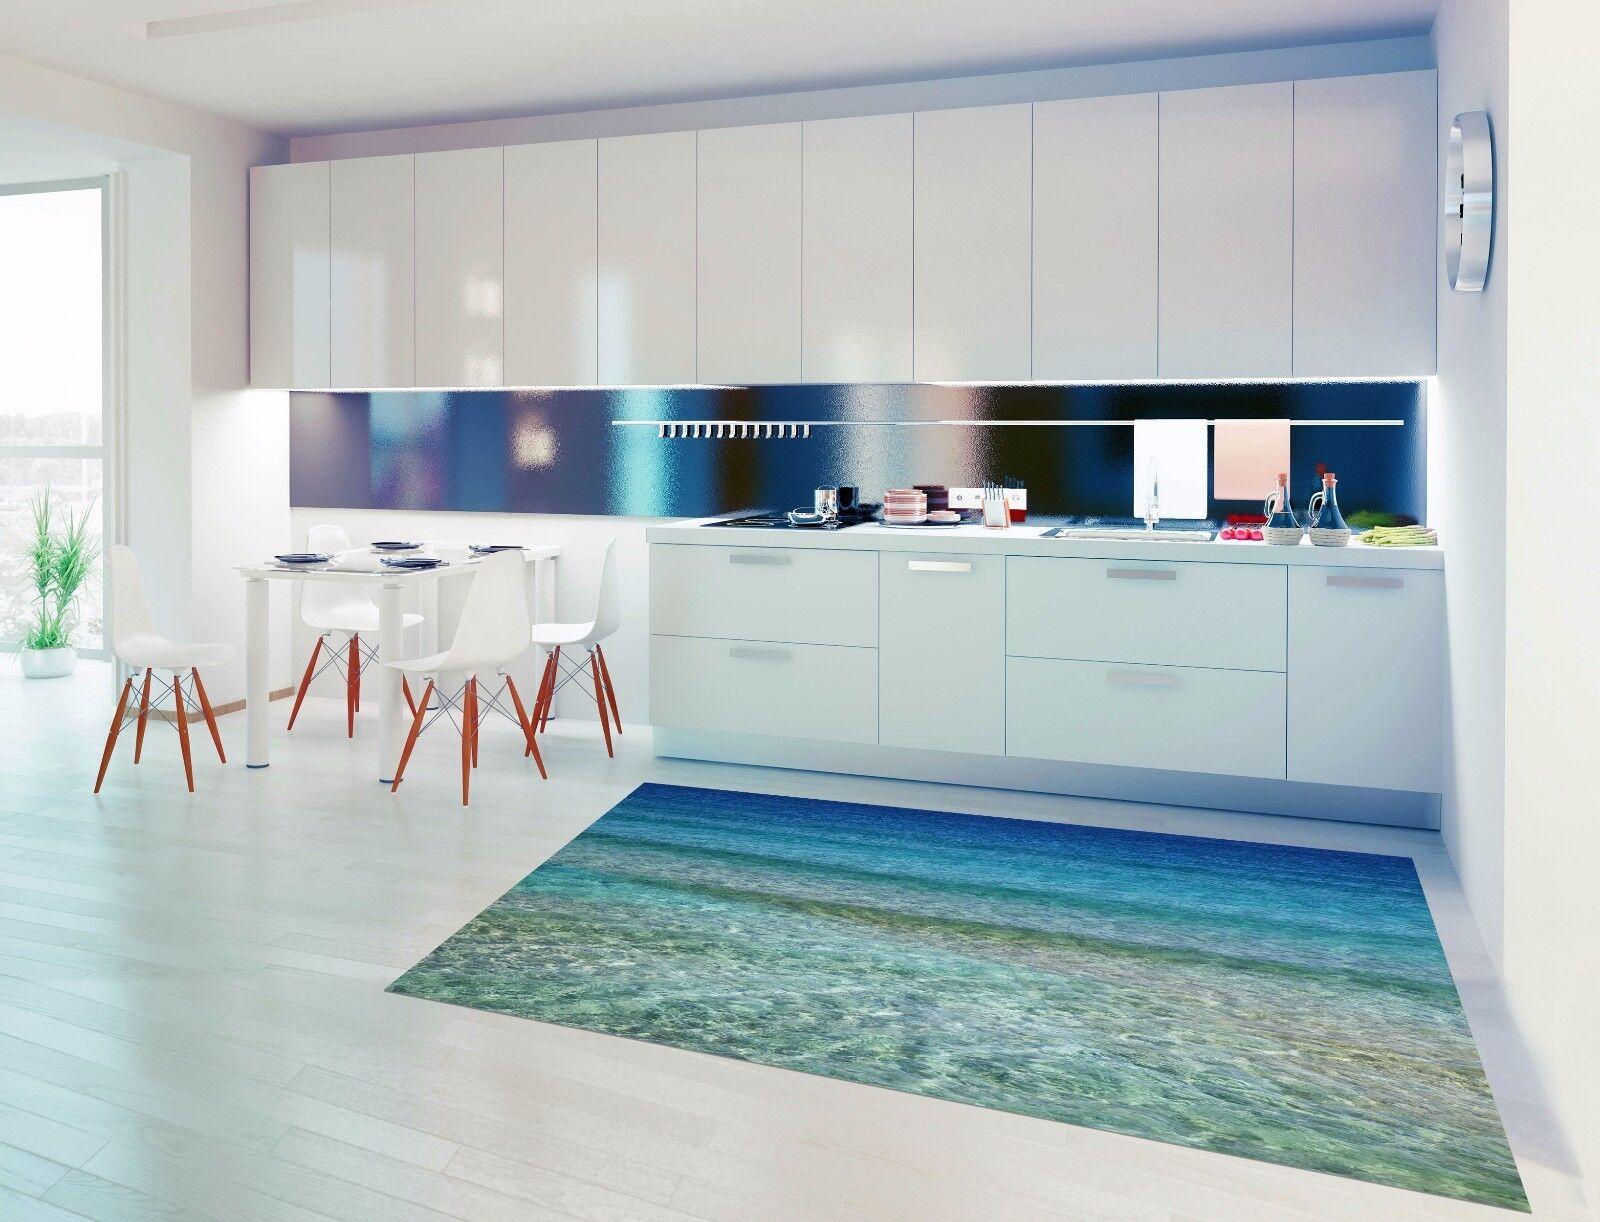 3D Sky Sea Water 4 Kitchen Mat Floor Murals Wall Print Wall AJ WALLPAPER UK Kyra